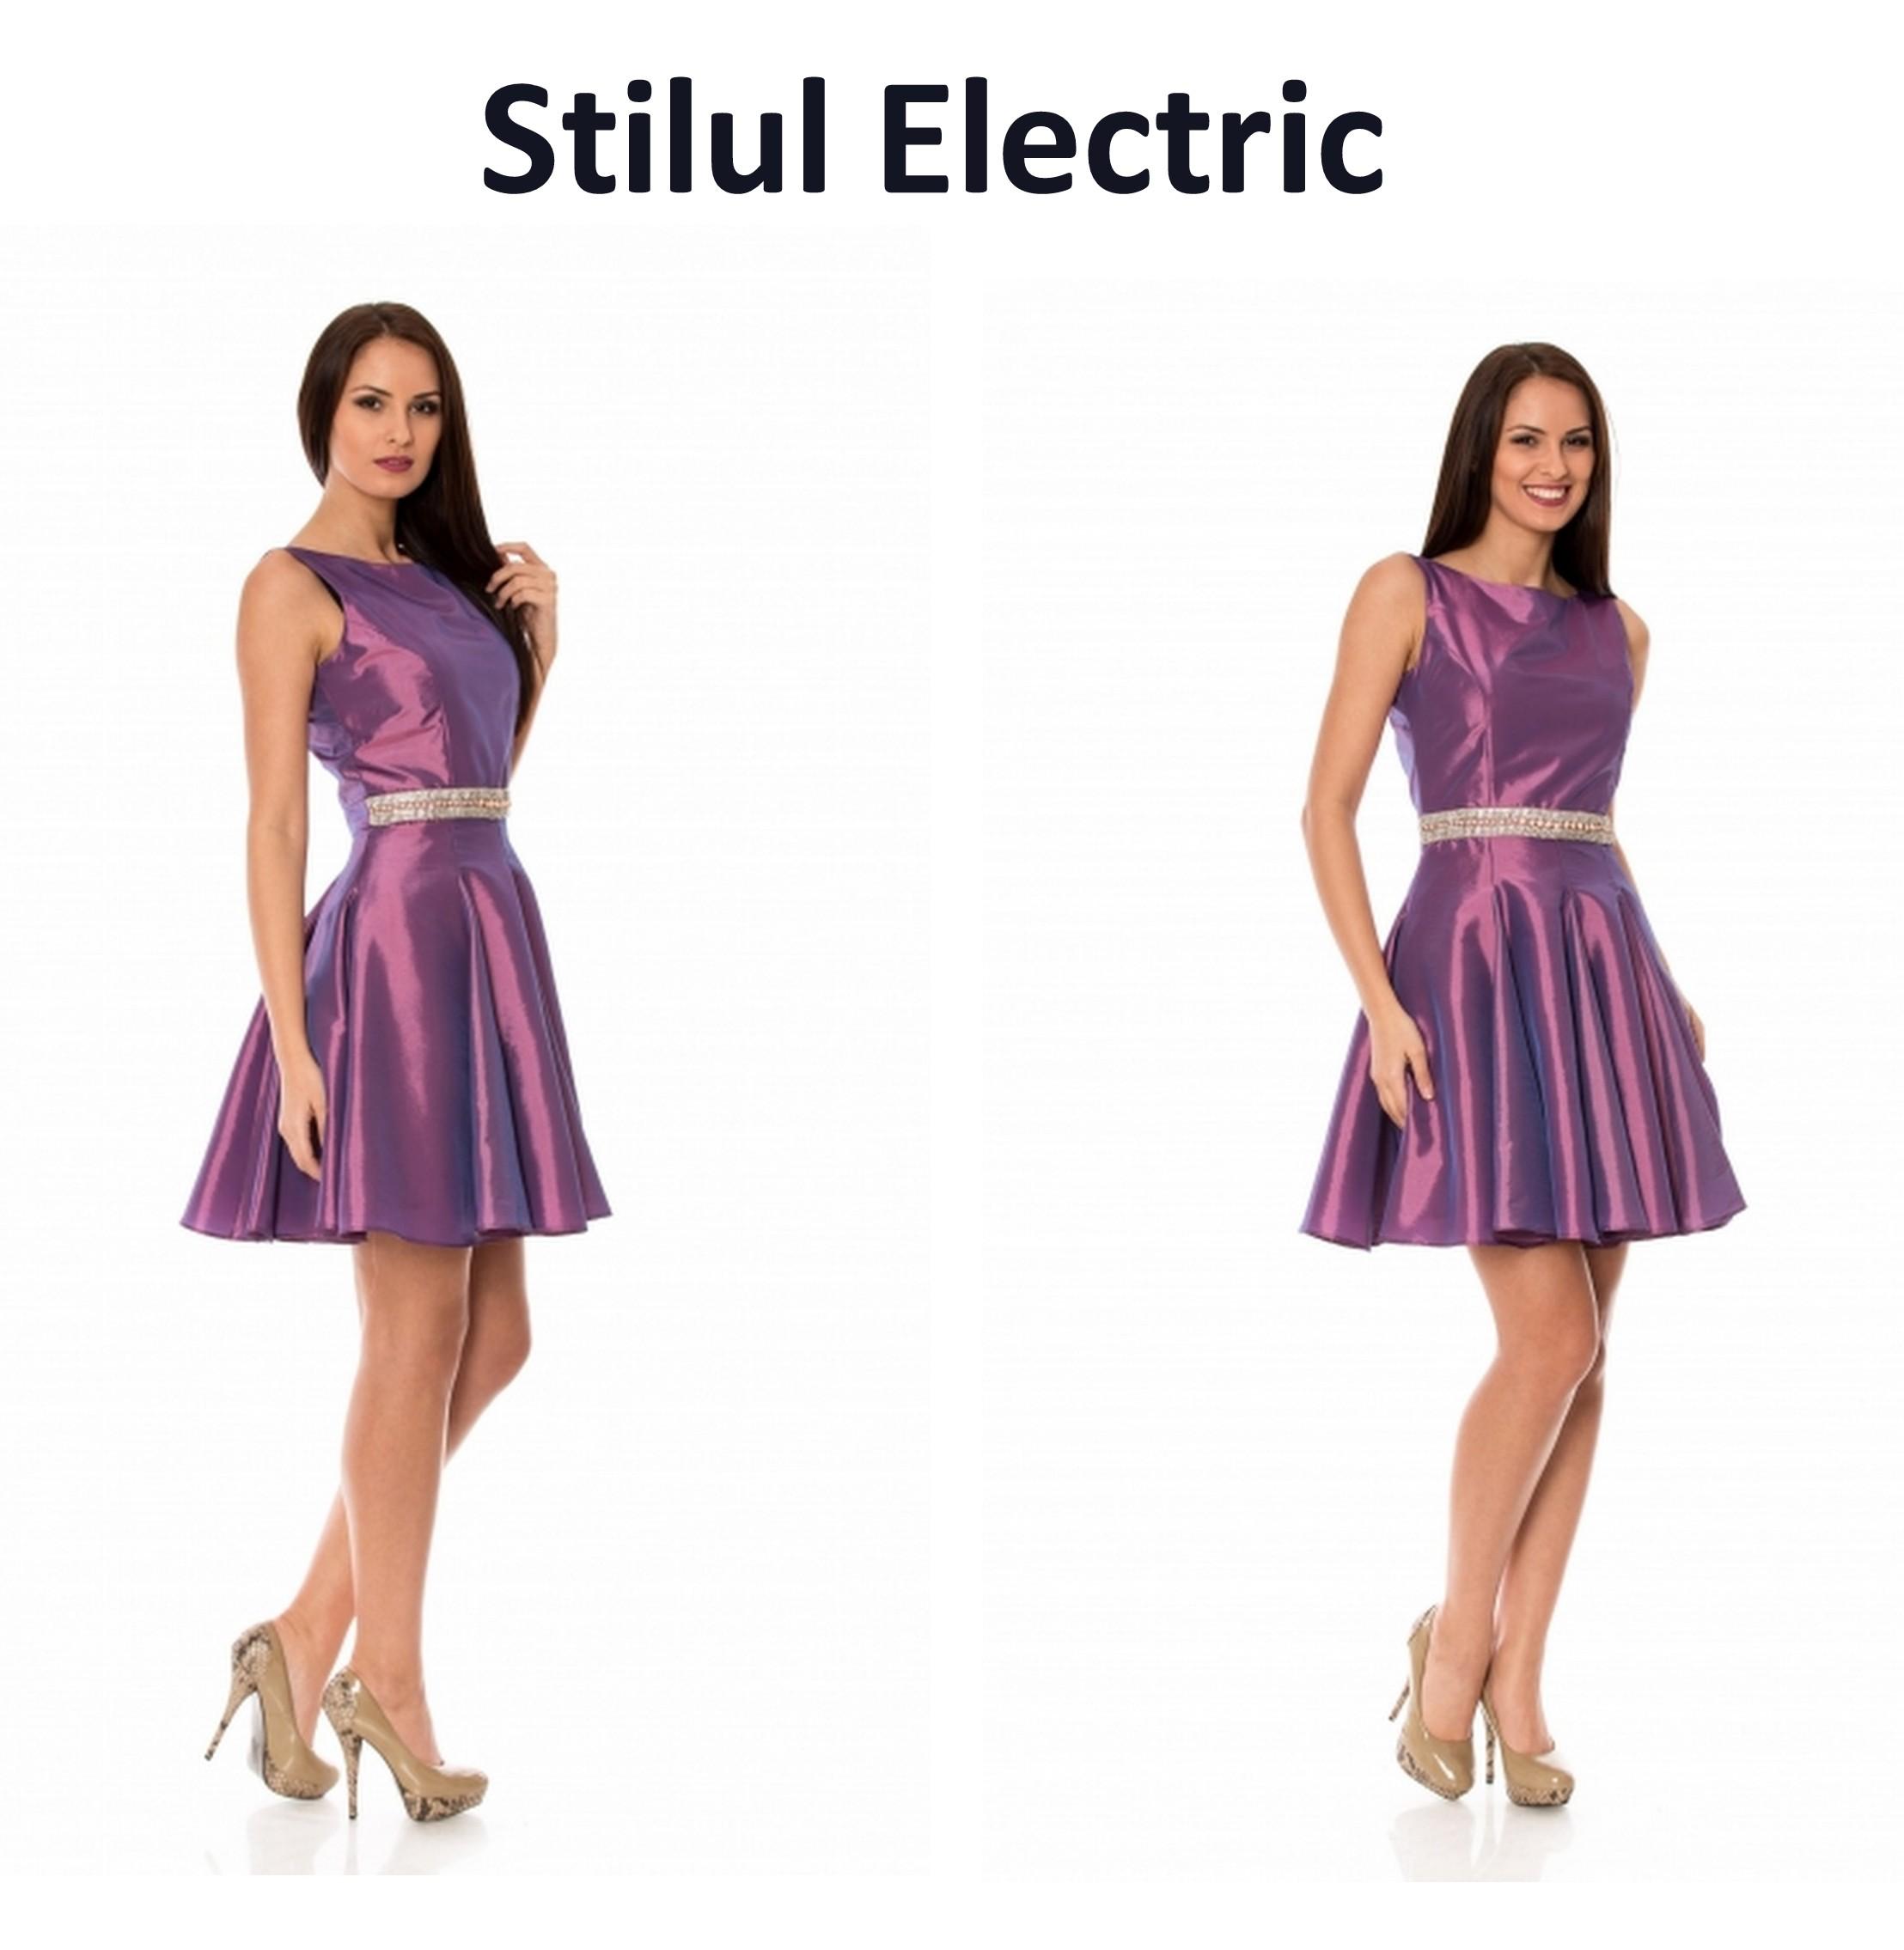 stilul-electric-tinuta-balul-bobocilor-2015